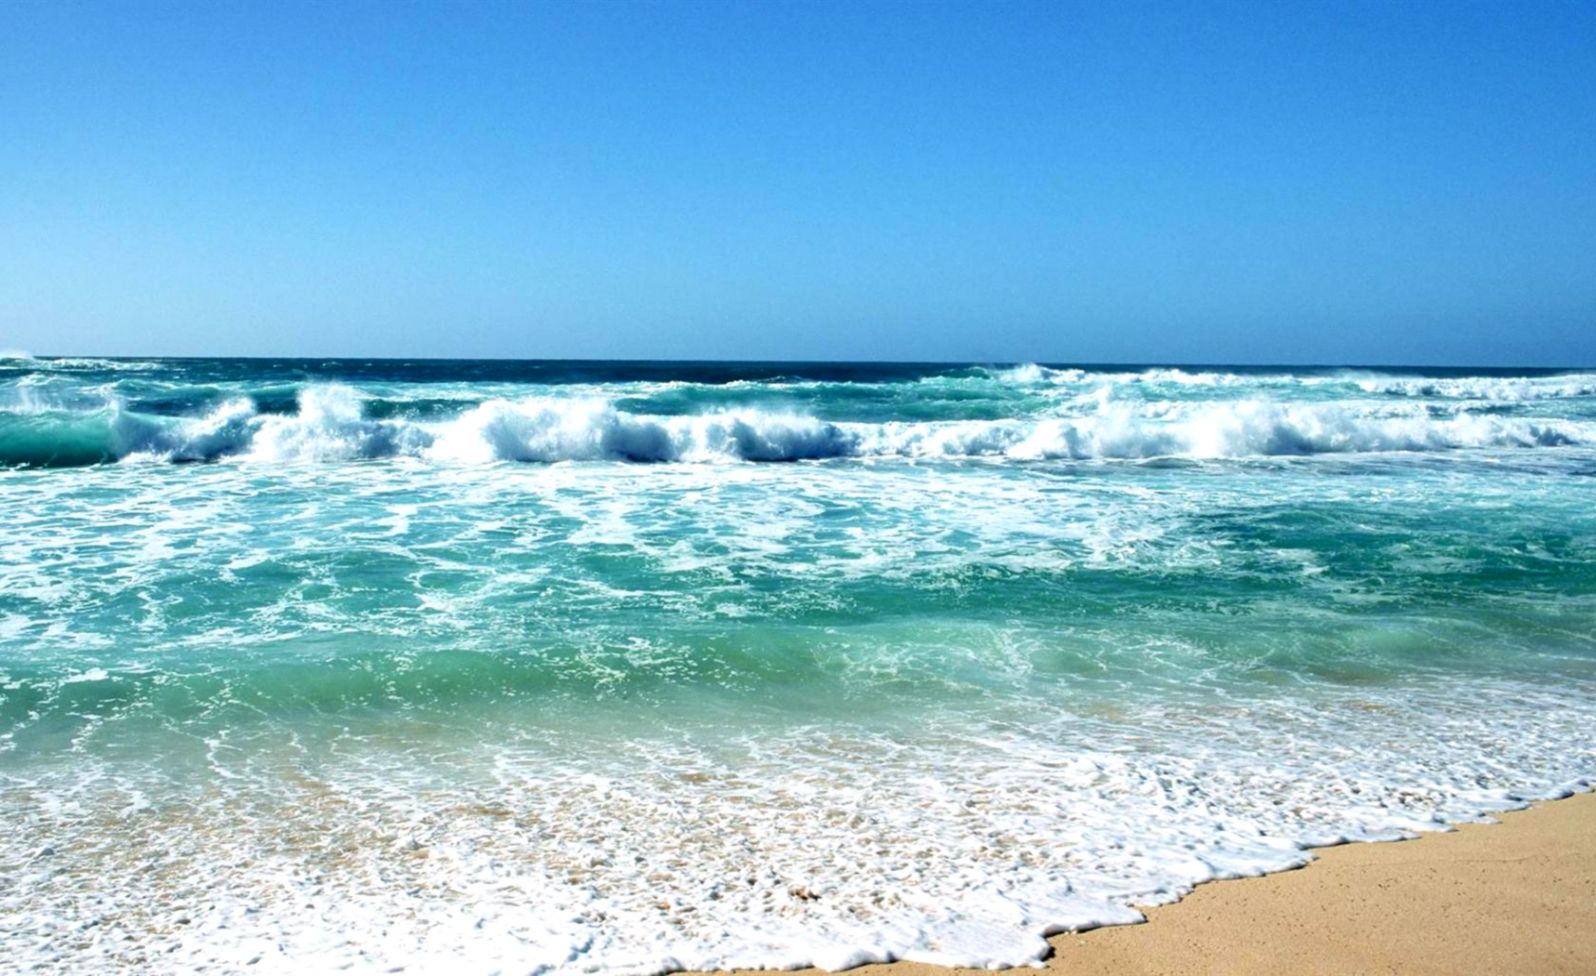 beach desktop backgrounds | best wallpapers hd gallery